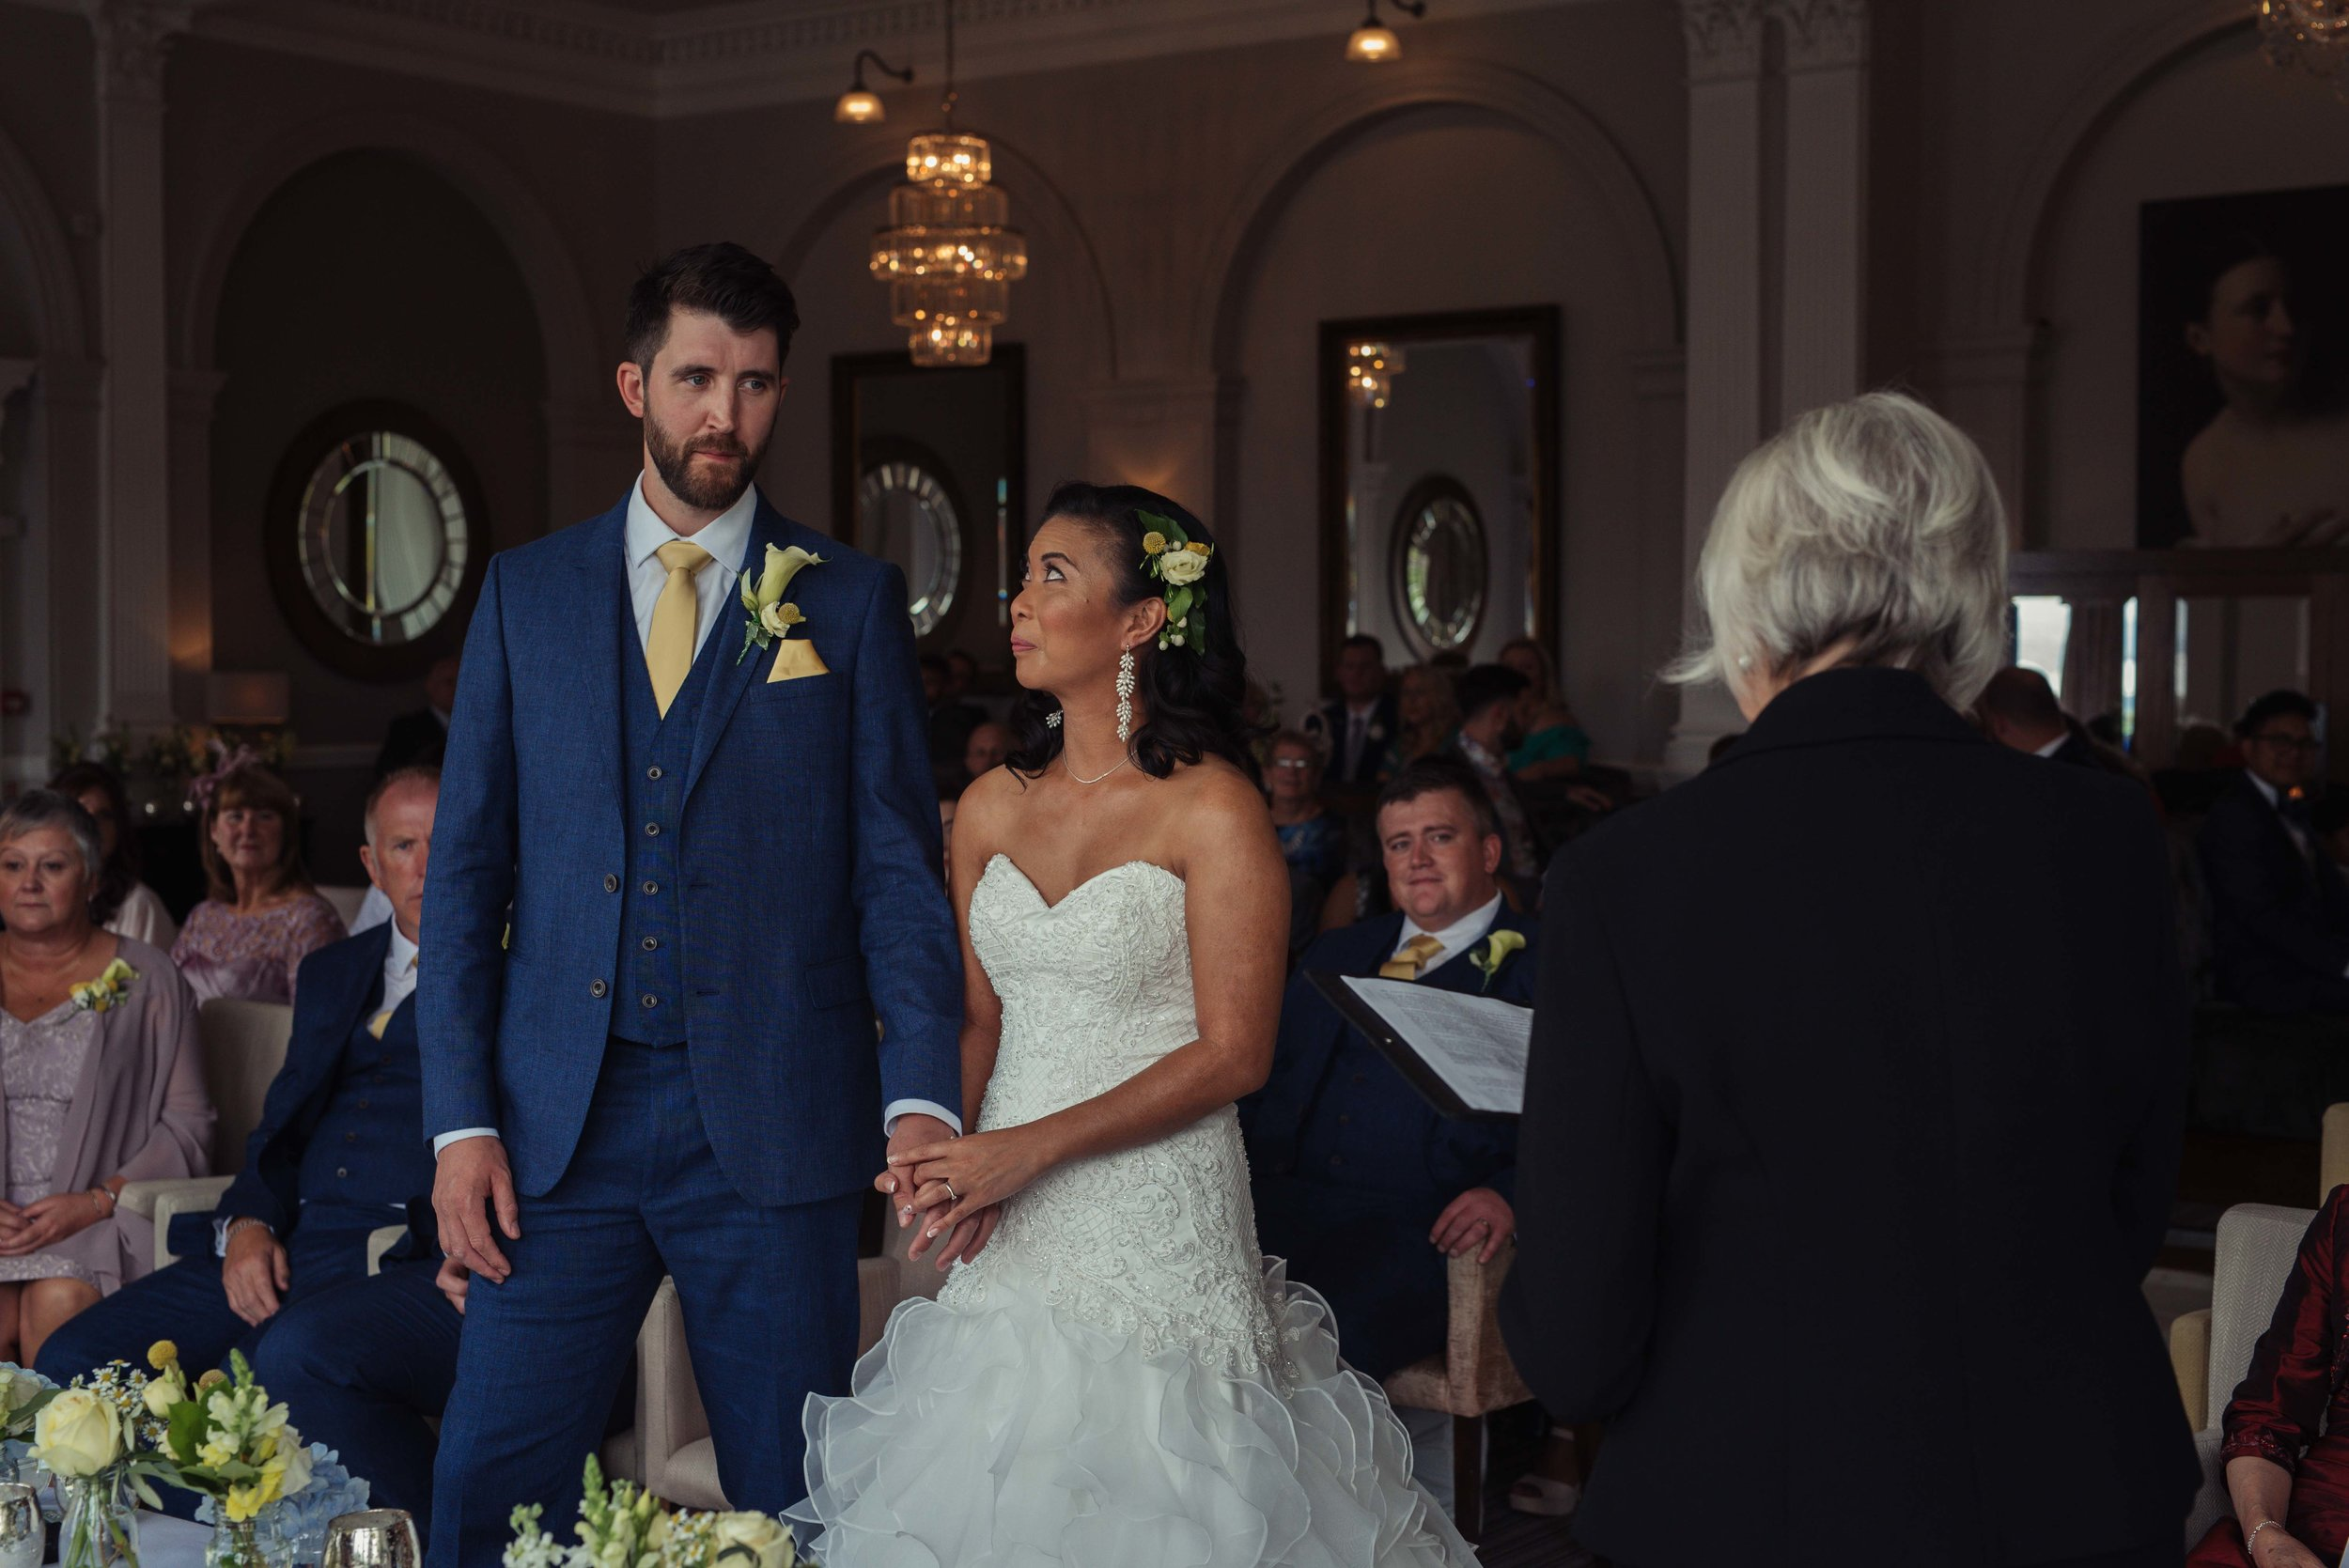 Belsfield Wedding Photography-33.jpg